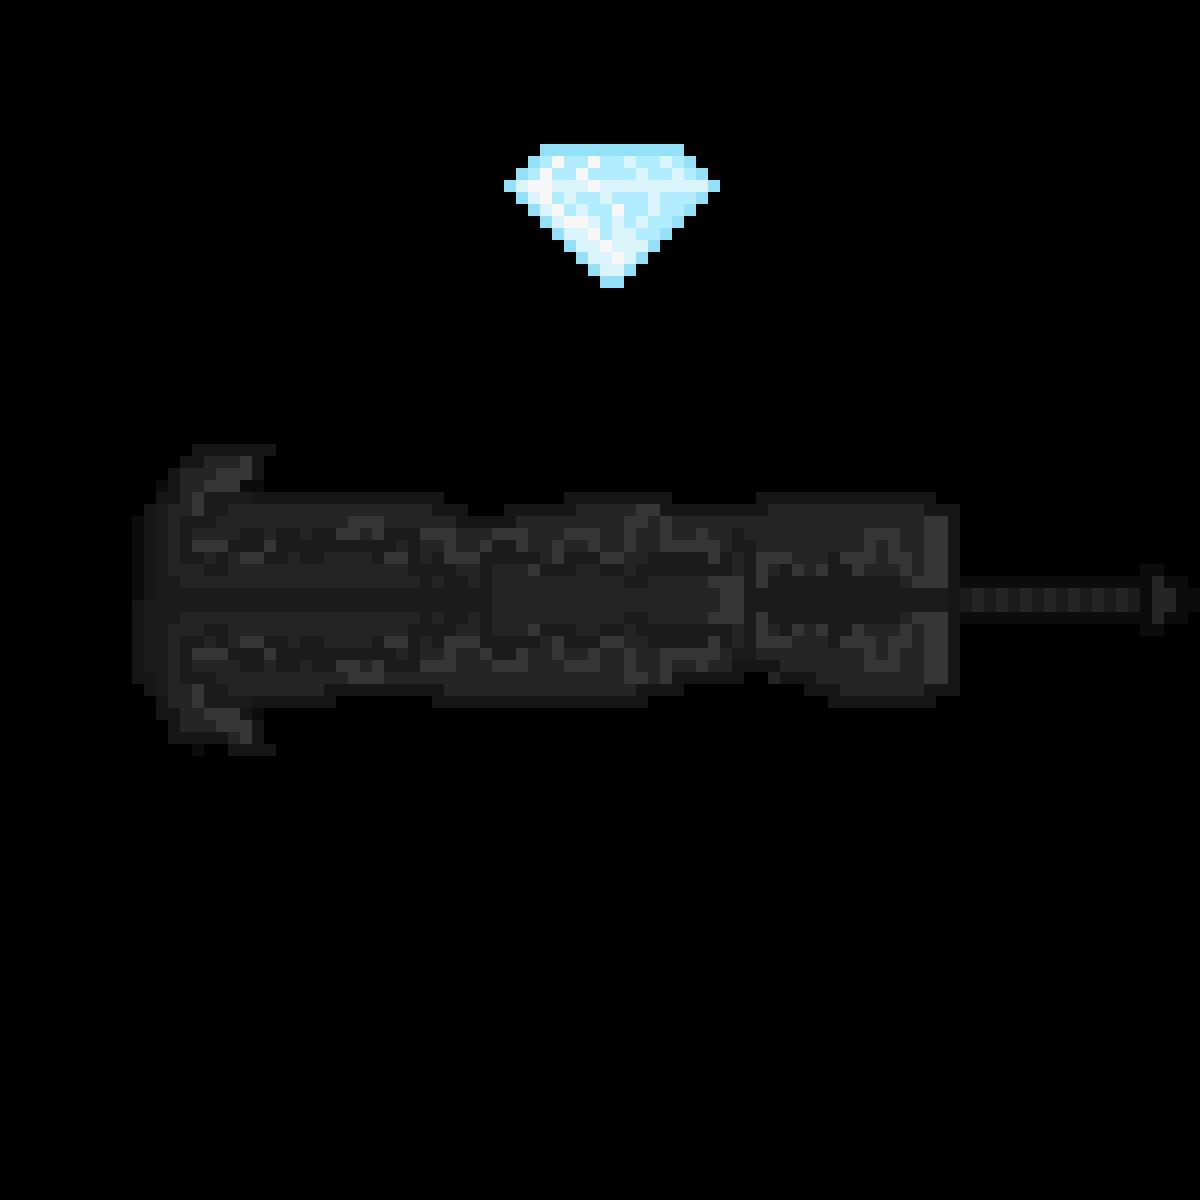 FUGS and Diamond by LtGoonie